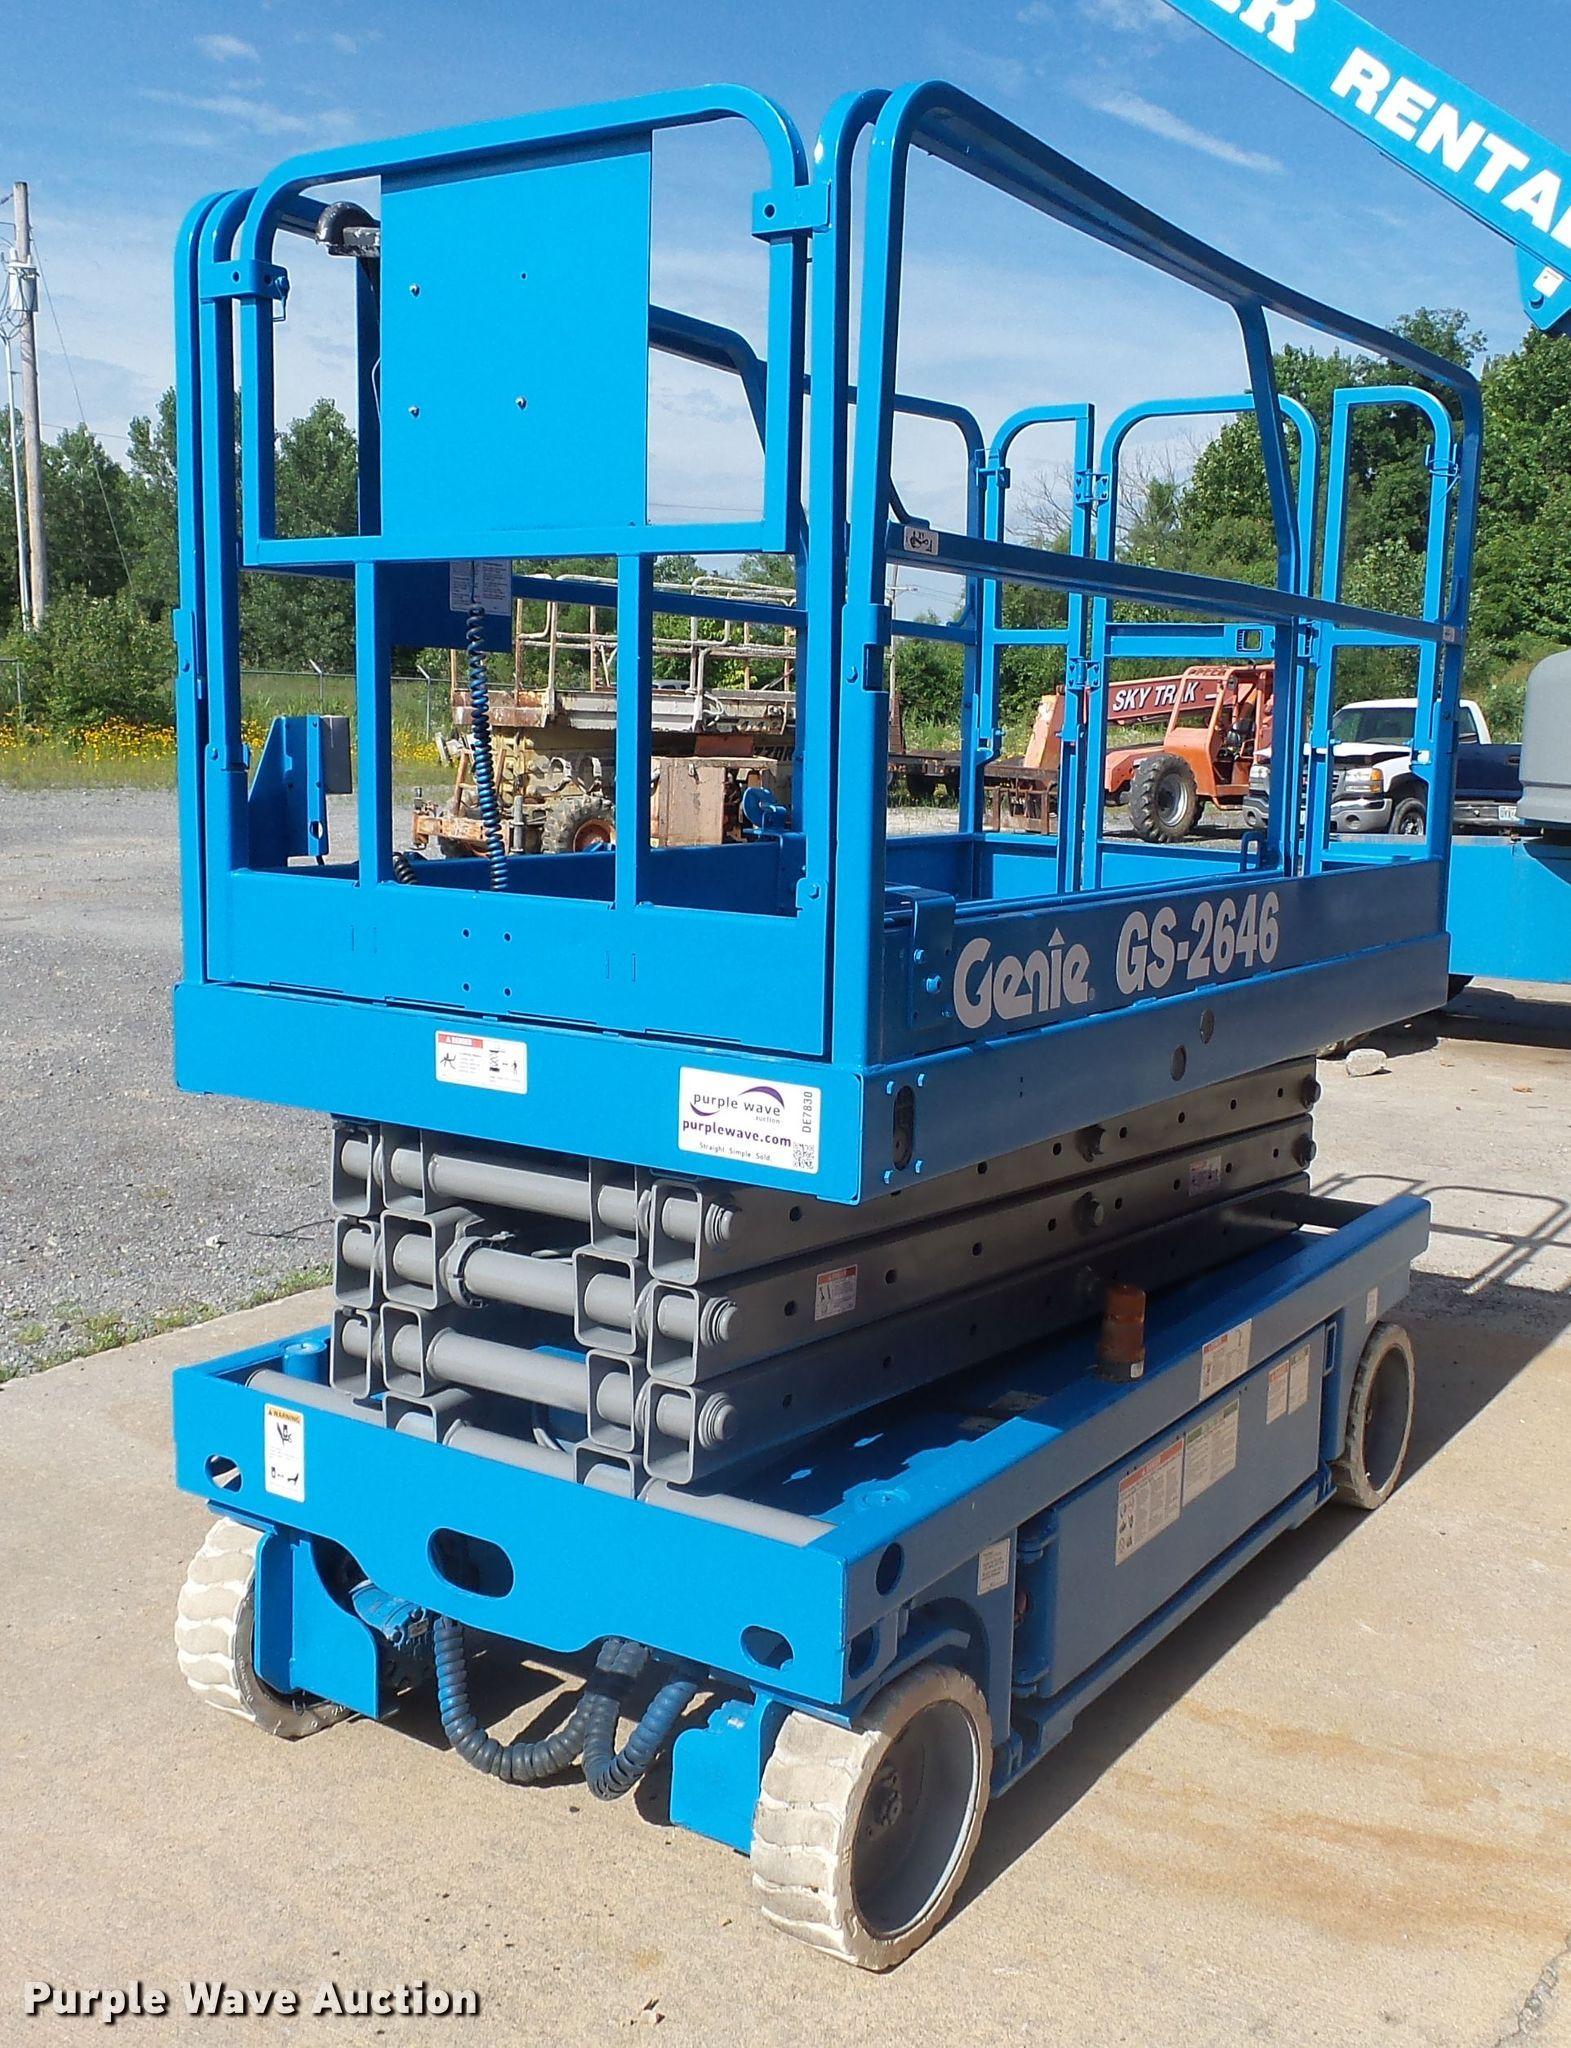 Genie GS2646 scissor lift | Item DE7830 | SOLD! July 25 Cons